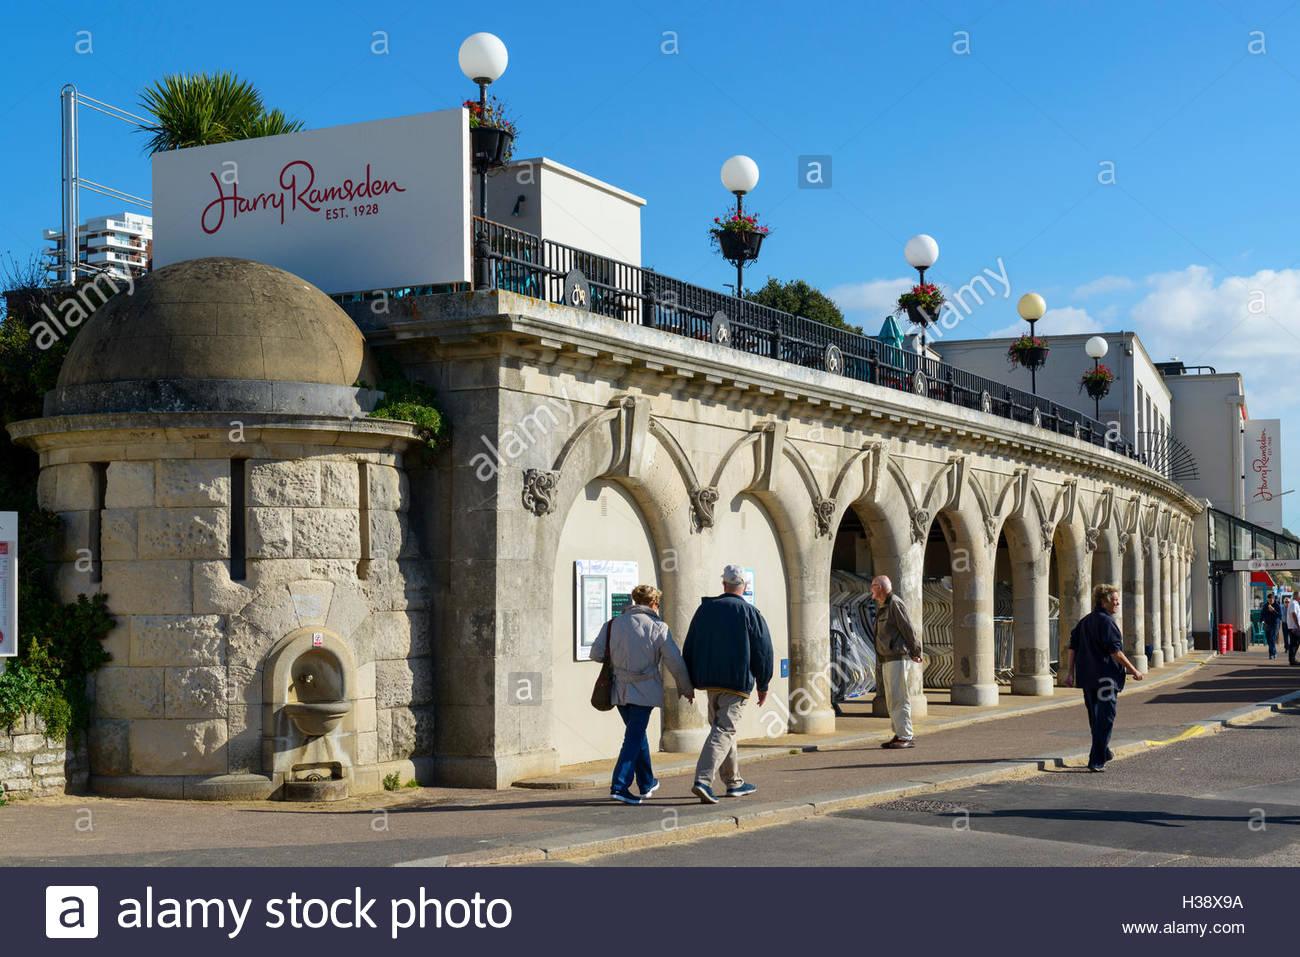 Harry Ramsden restaurant, Bournemouth, Dorset, England, UK Stock Photo